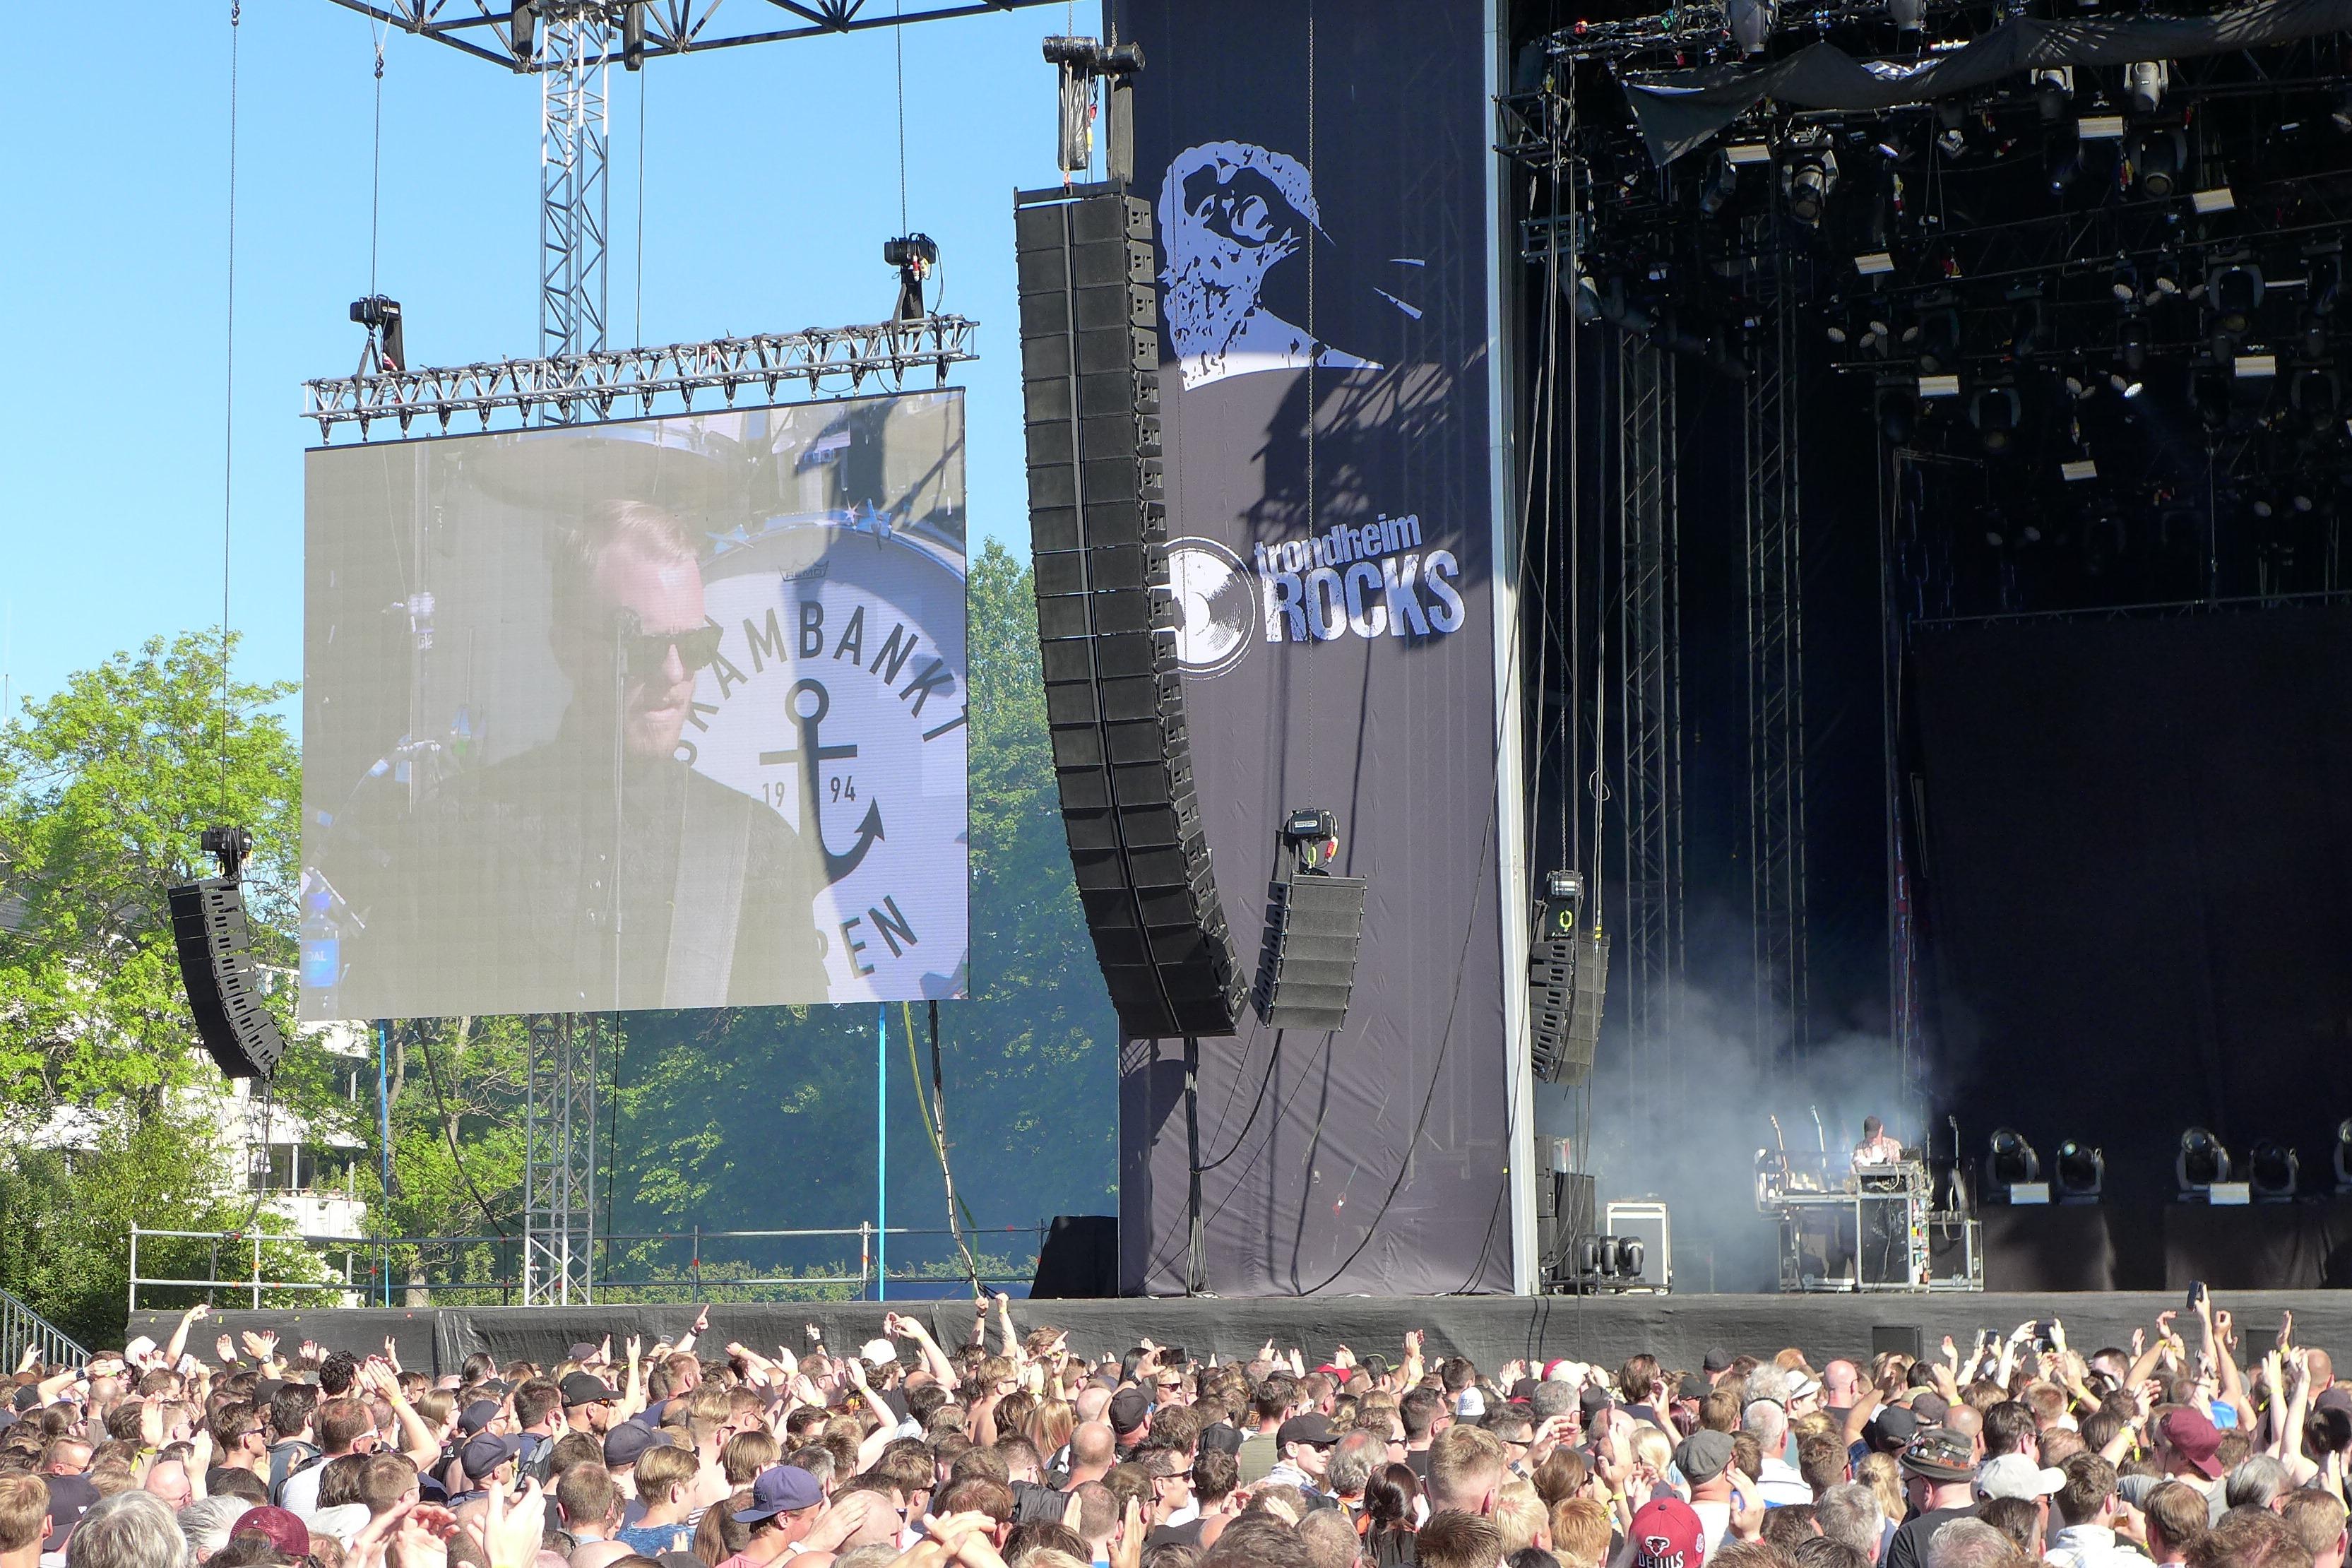 TrondheimRocks-stage-left.jpg